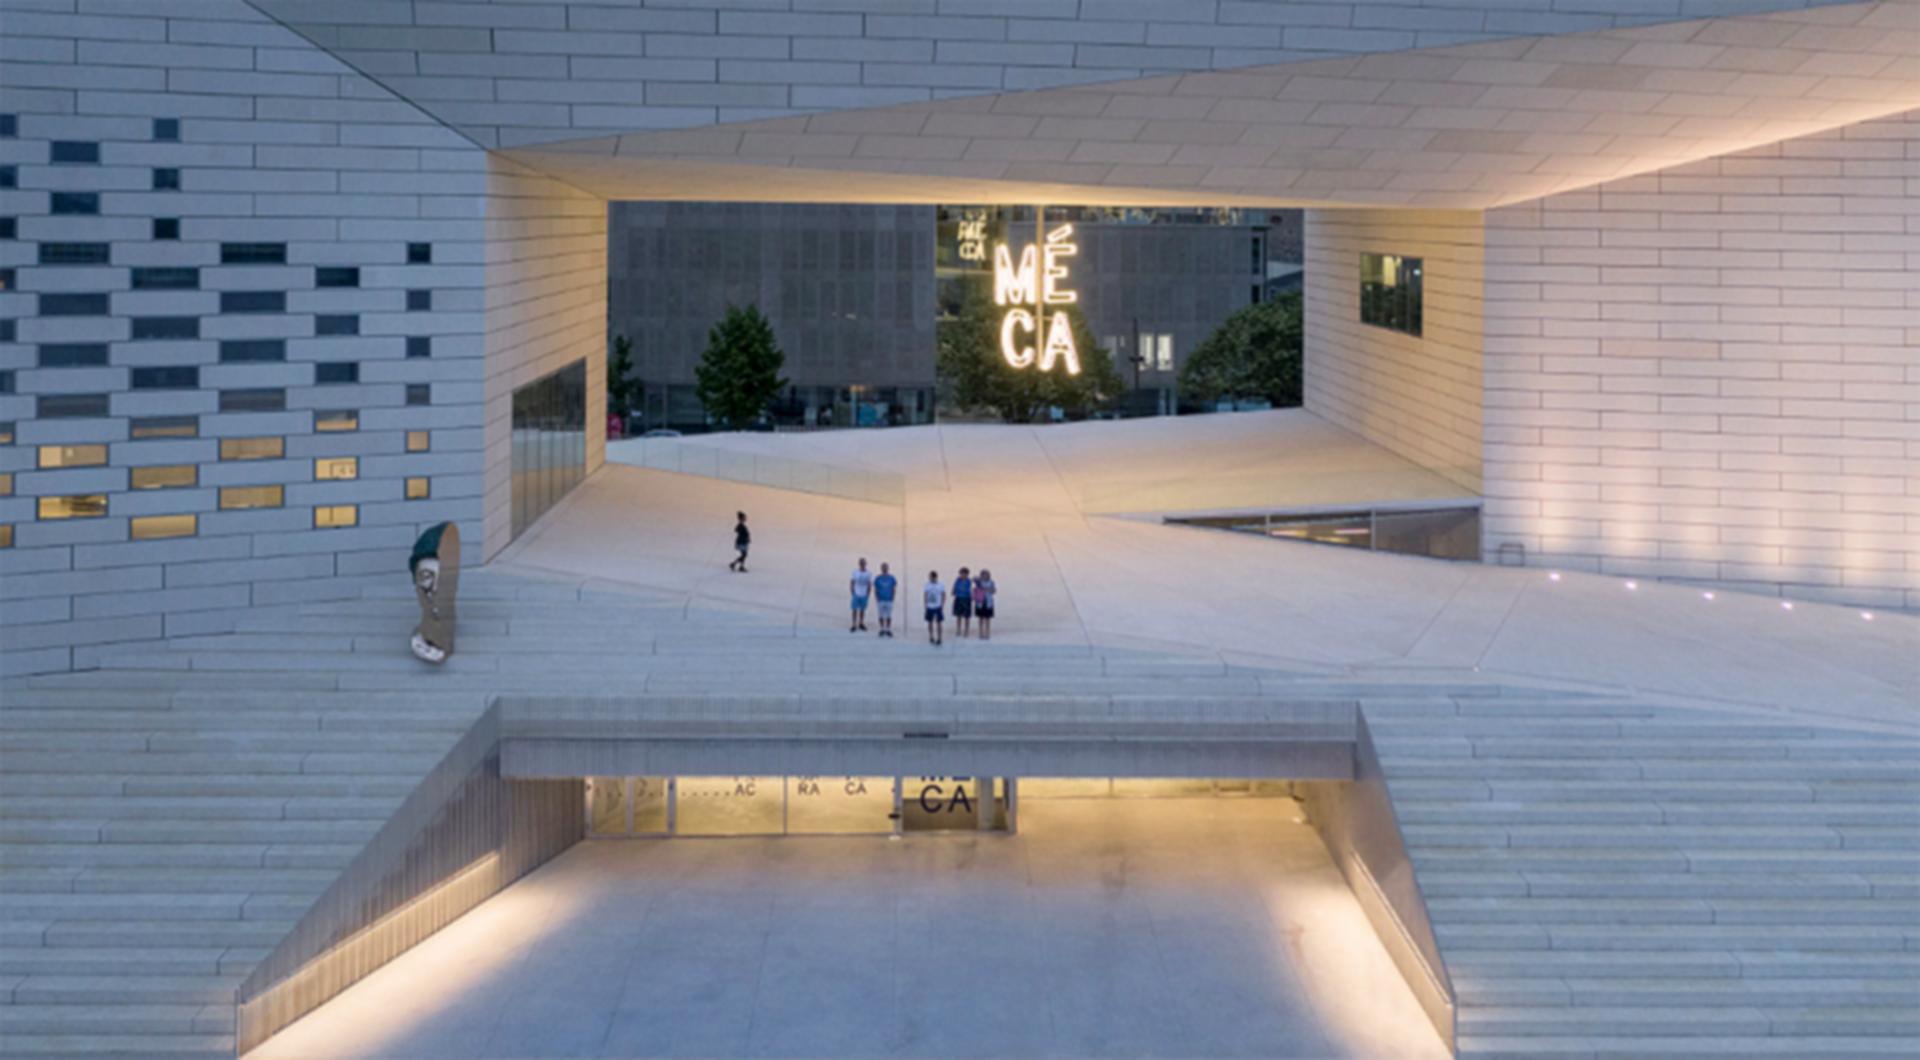 MECA - Entrance